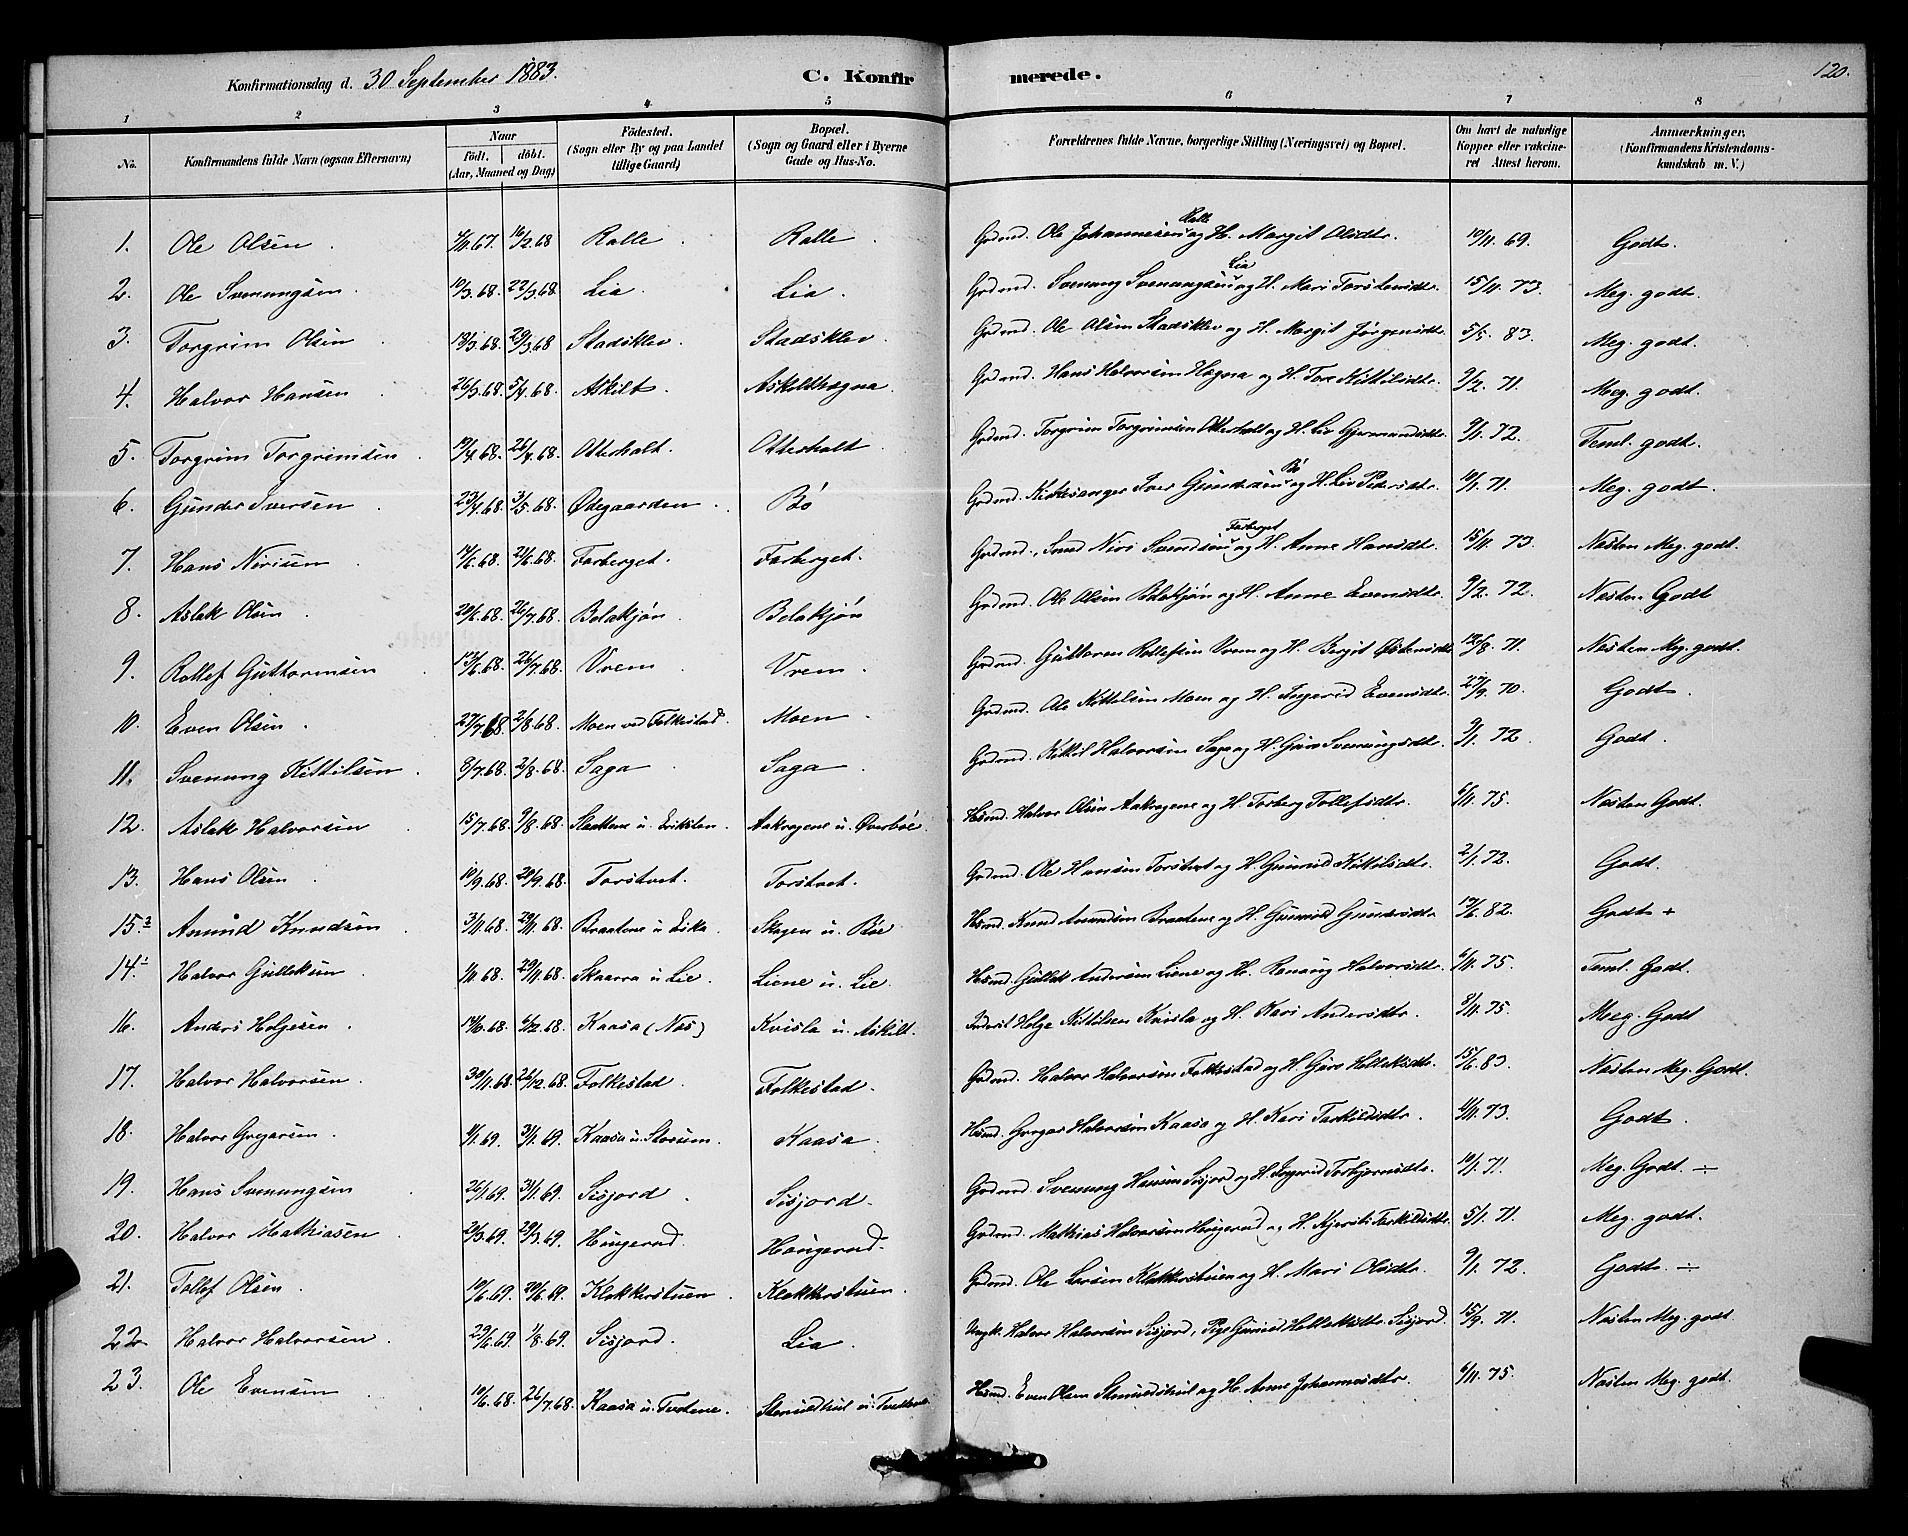 SAKO, Bø kirkebøker, G/Ga/L0005: Klokkerbok nr. 5, 1883-1897, s. 120